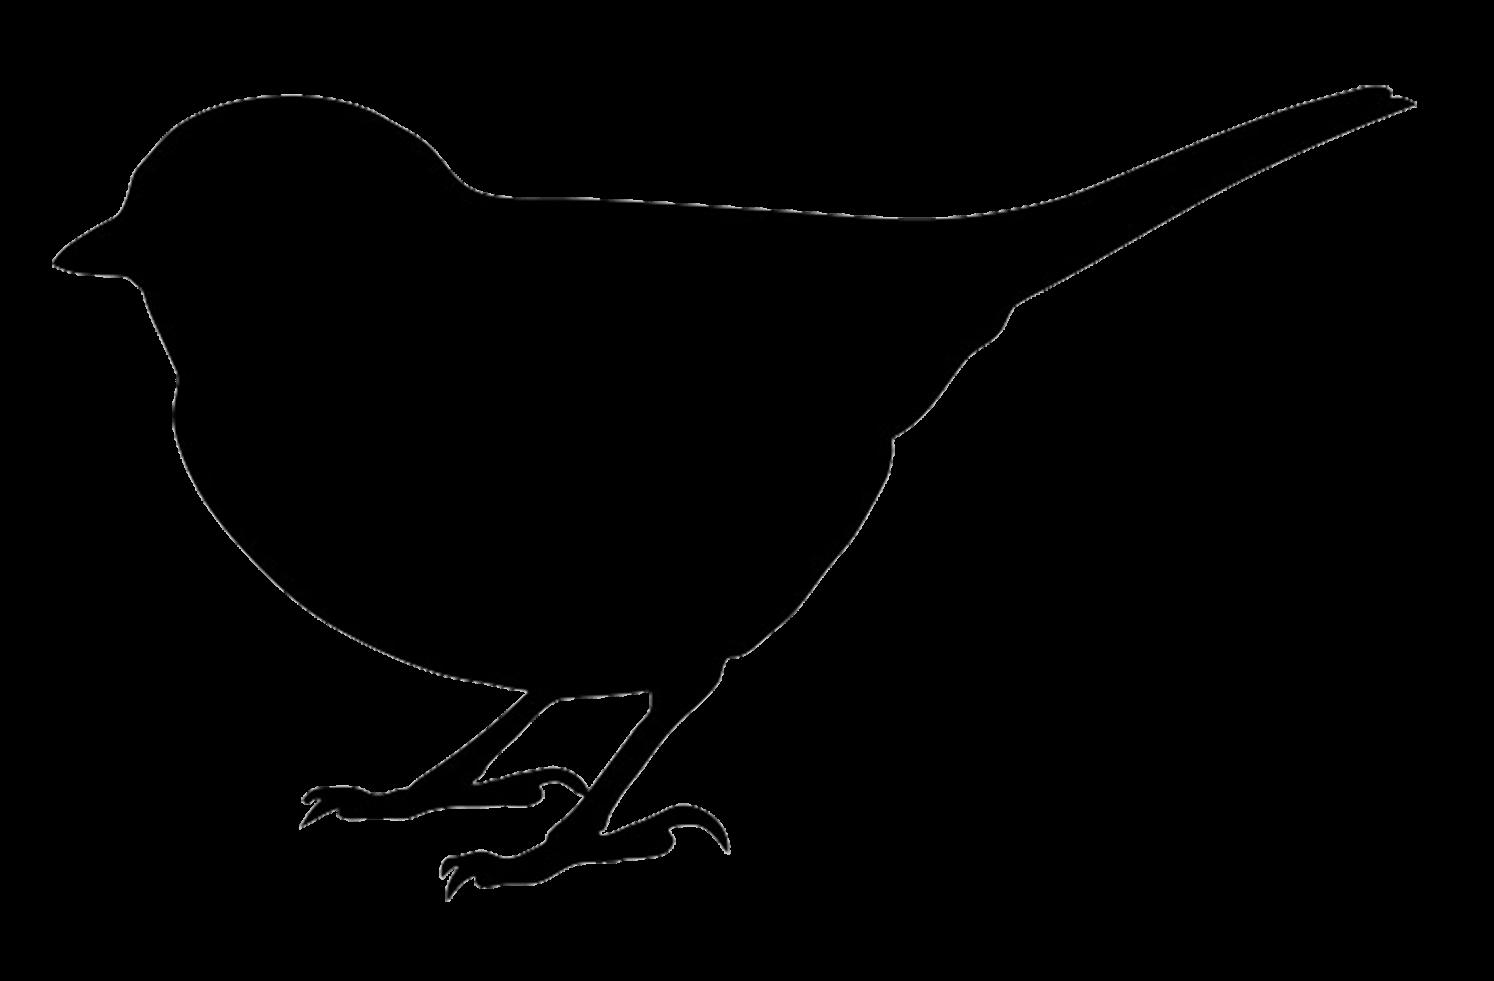 Free Bird Black Cliparts, Download Free Clip Art, Free Clip.